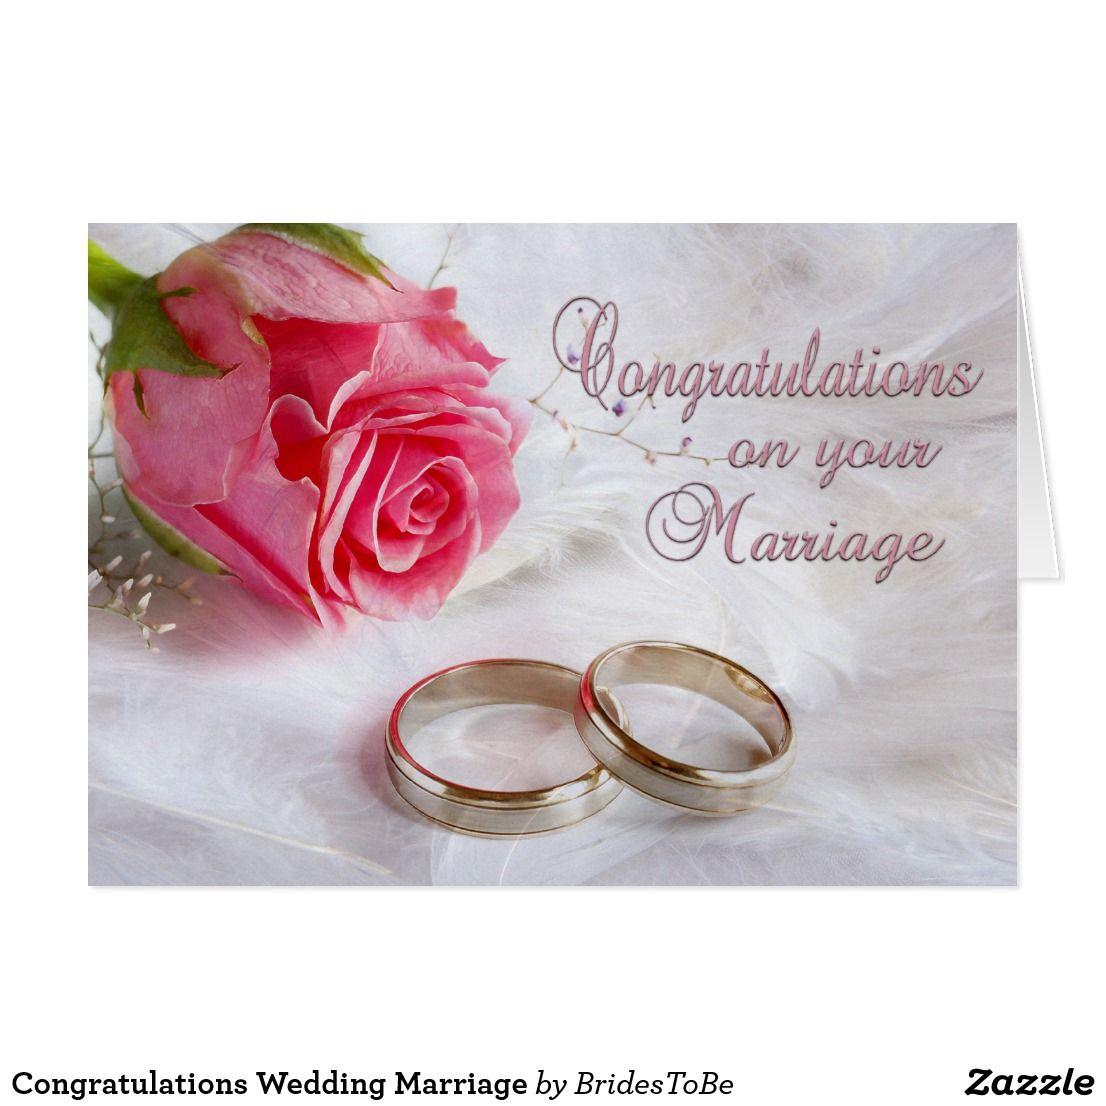 Congratulations Wedding Marriage Card Marriage Cards Wedding